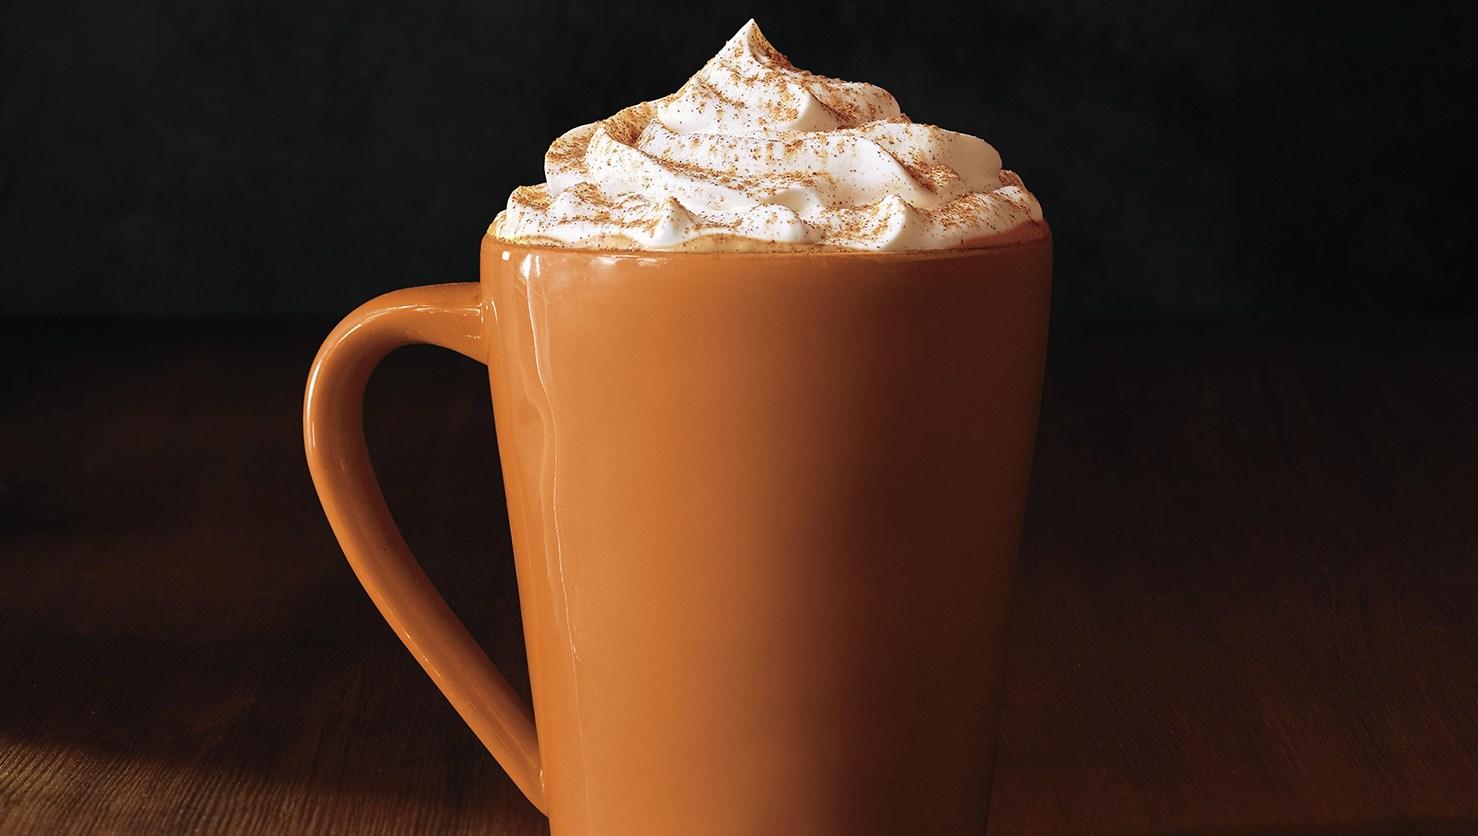 Starbucks' seasonal Pumpkin Spice Latte.